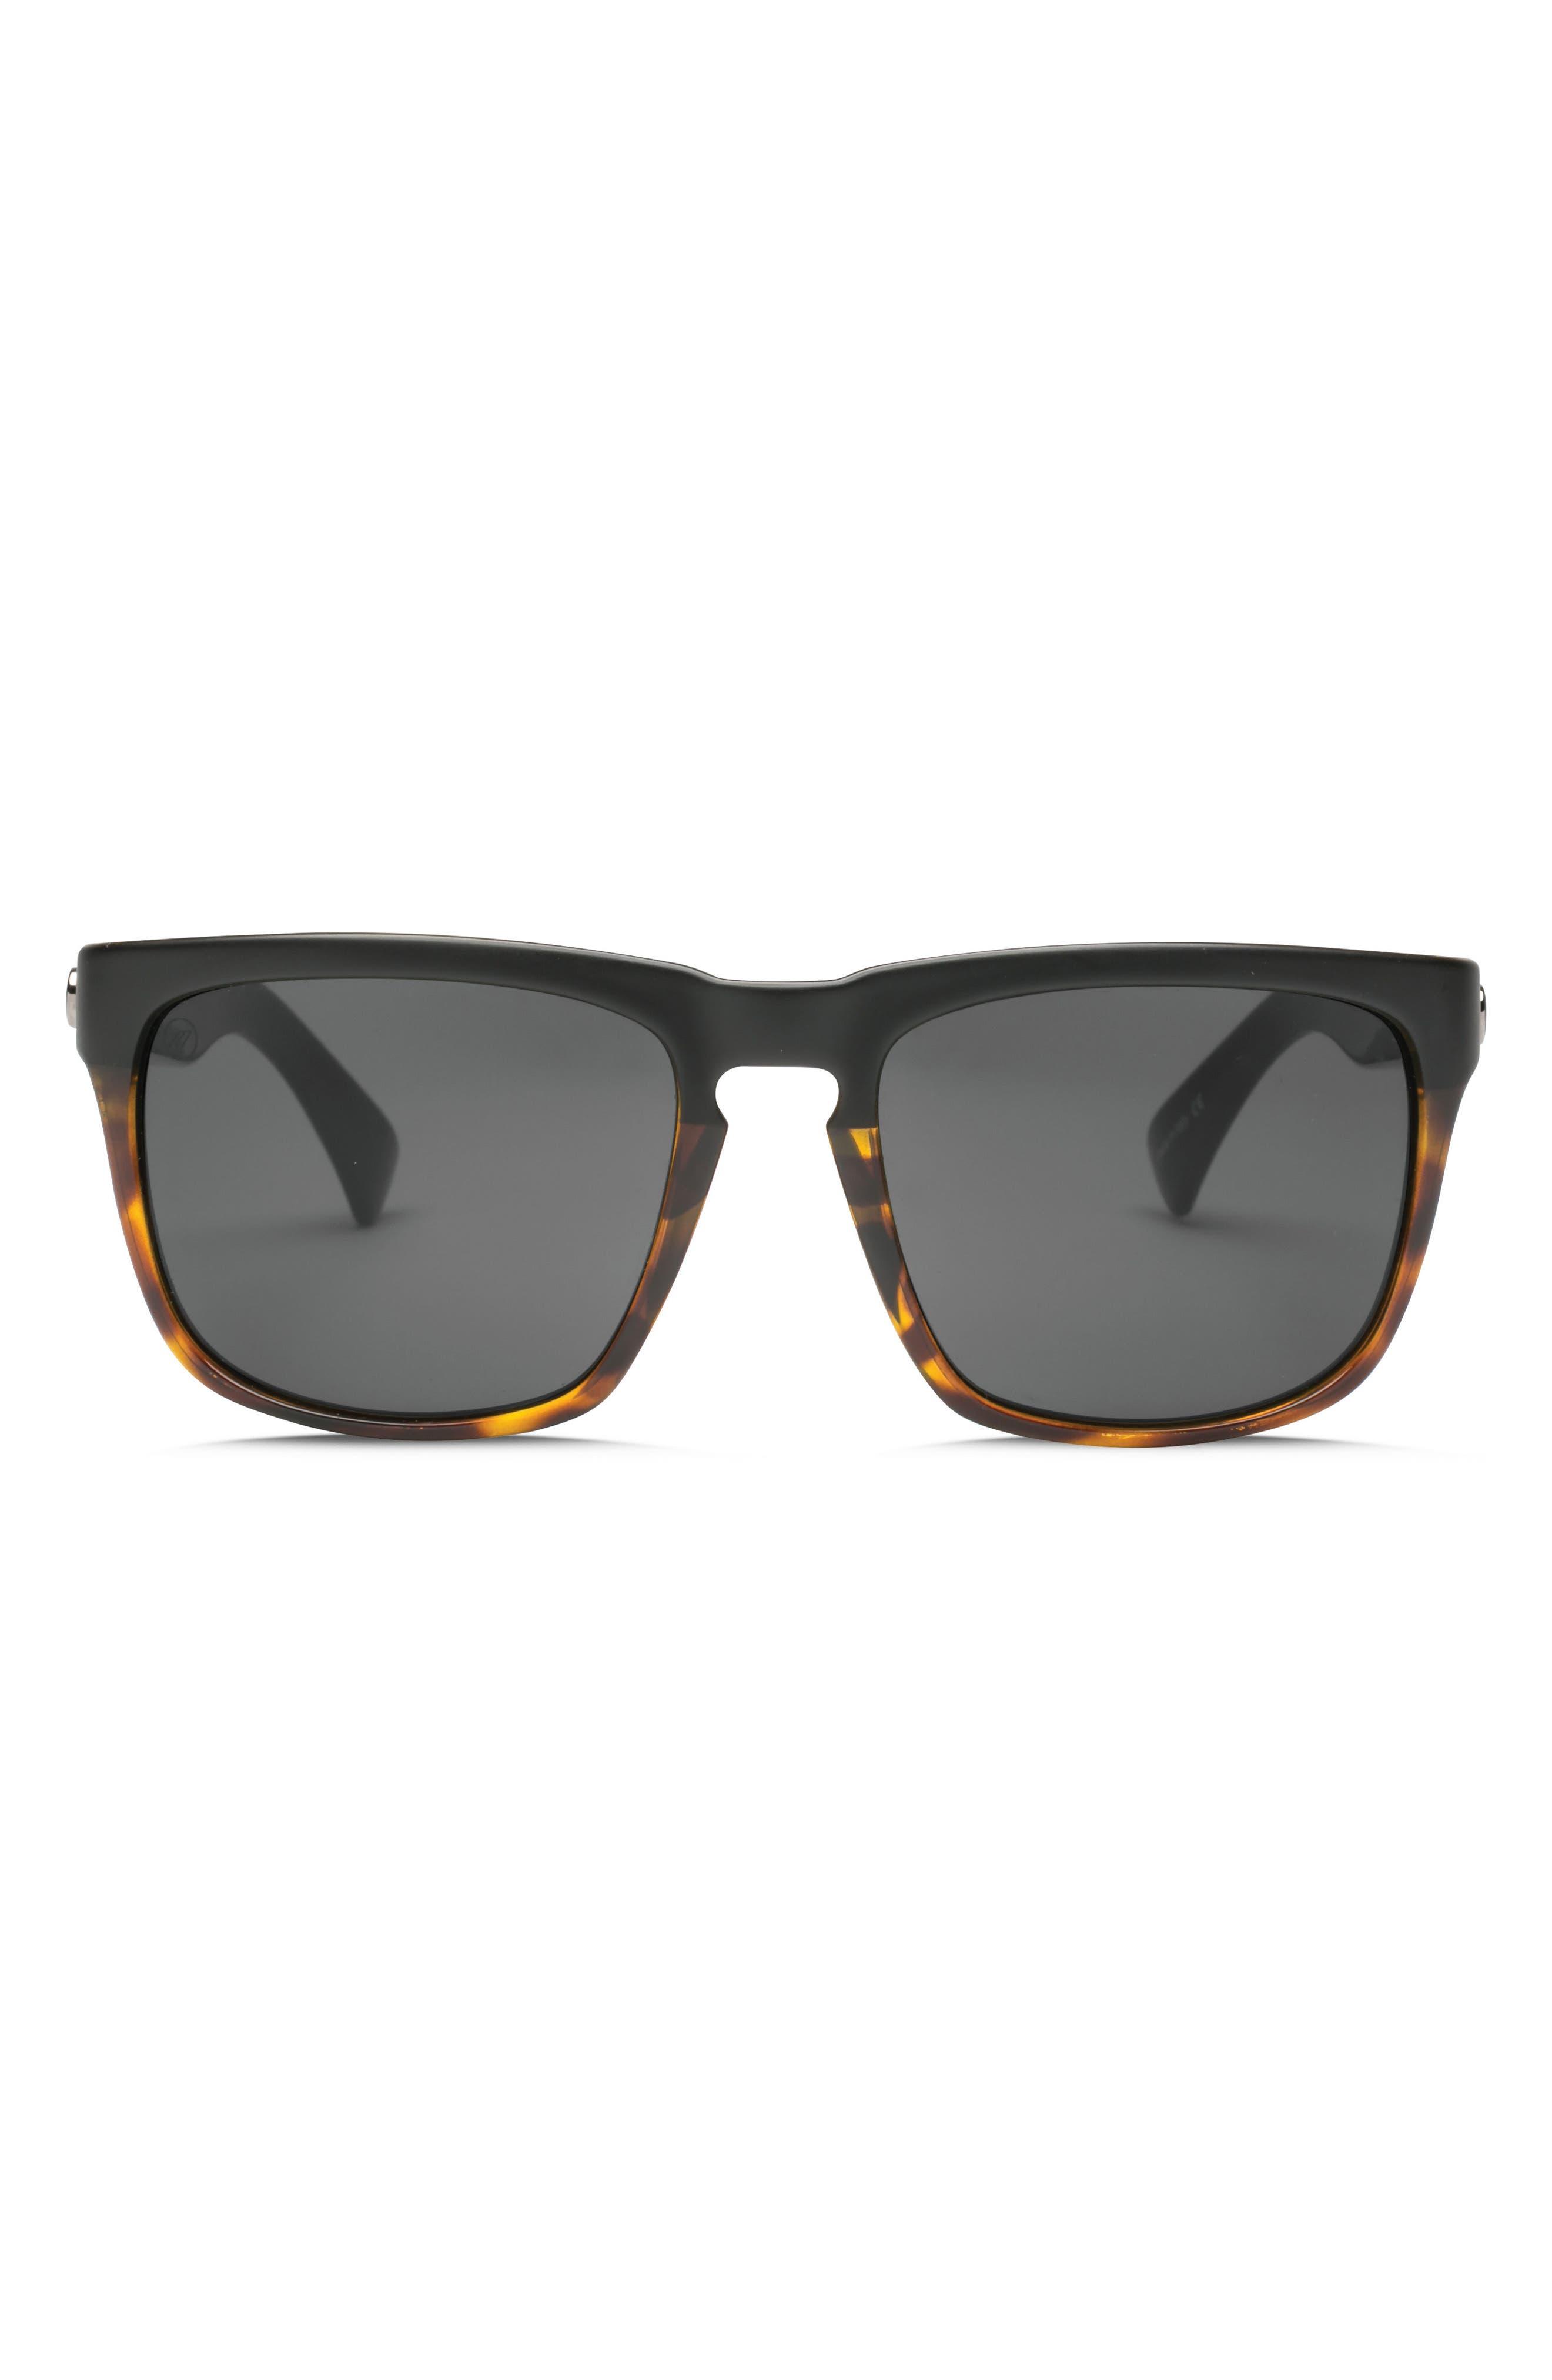 Knoxville XL 61mm Sunglasses,                             Main thumbnail 1, color,